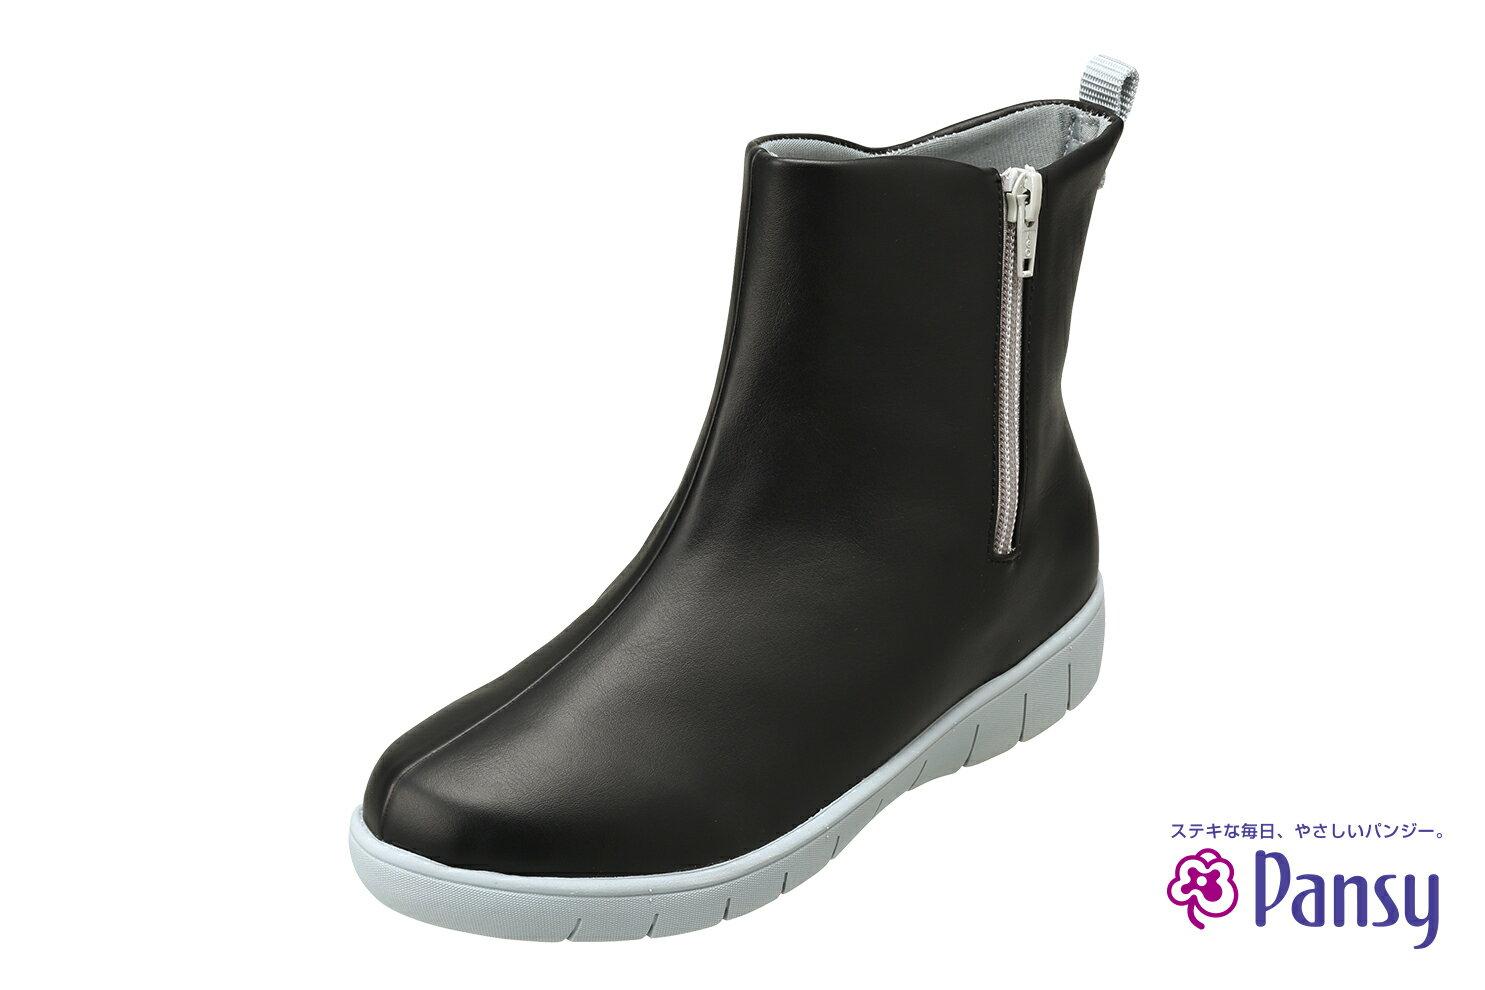 PANSY 女性 時尚撞色 短筒雨鞋 QA4944 5